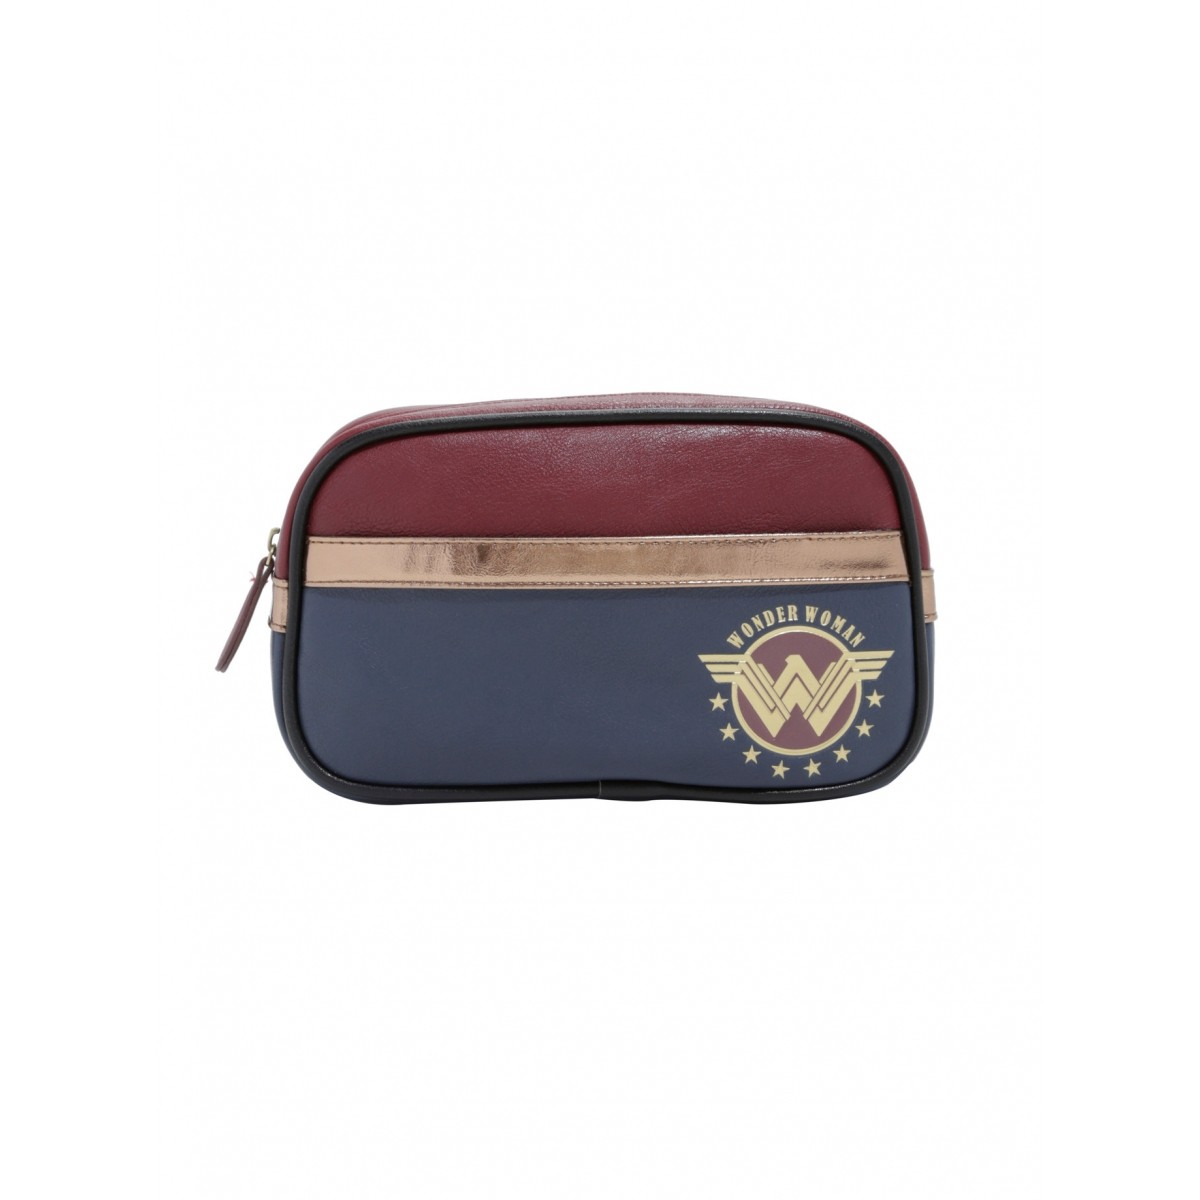 Bolsa de Maquiagem (Makeup Bag) Mulher Maravilha (Wonder Woman): DC Comics